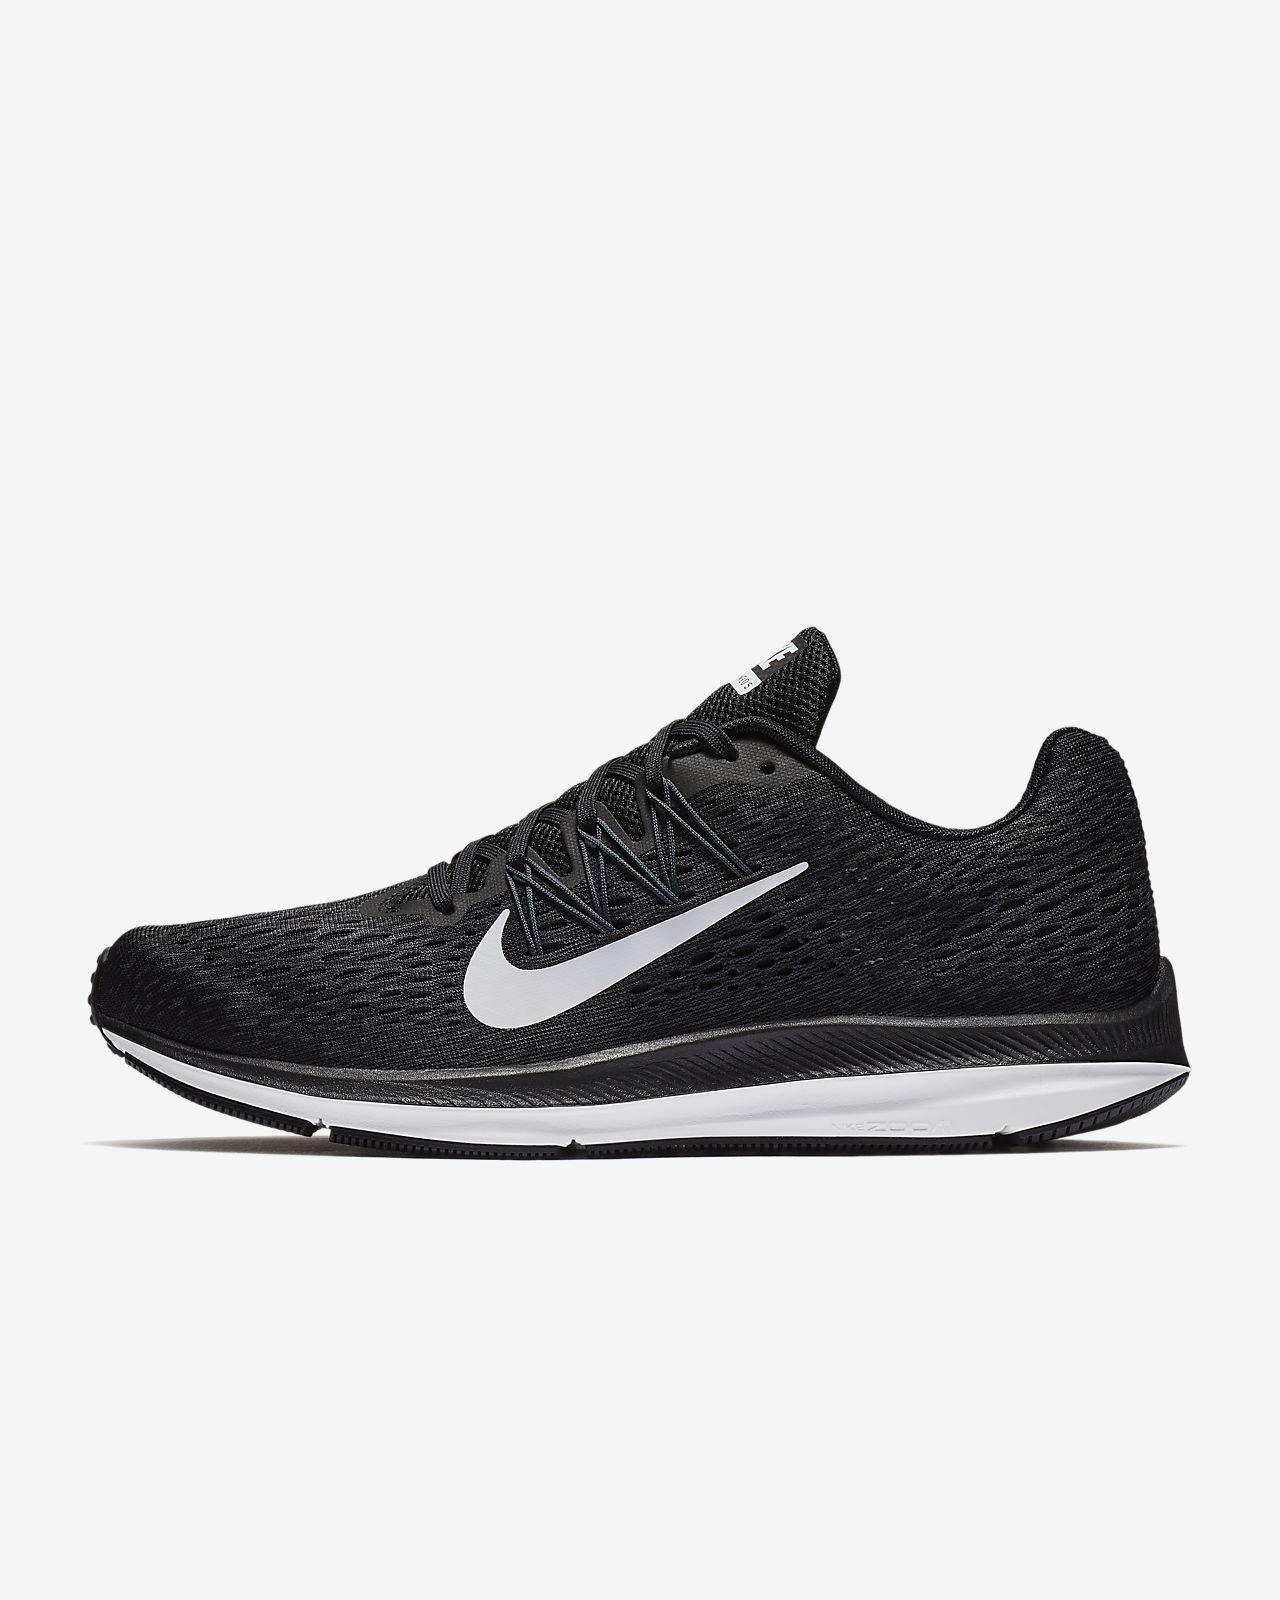 Nike Air Zoom Winflo 5 Men s Running Shoe. Nike.com BE c037fd4cd